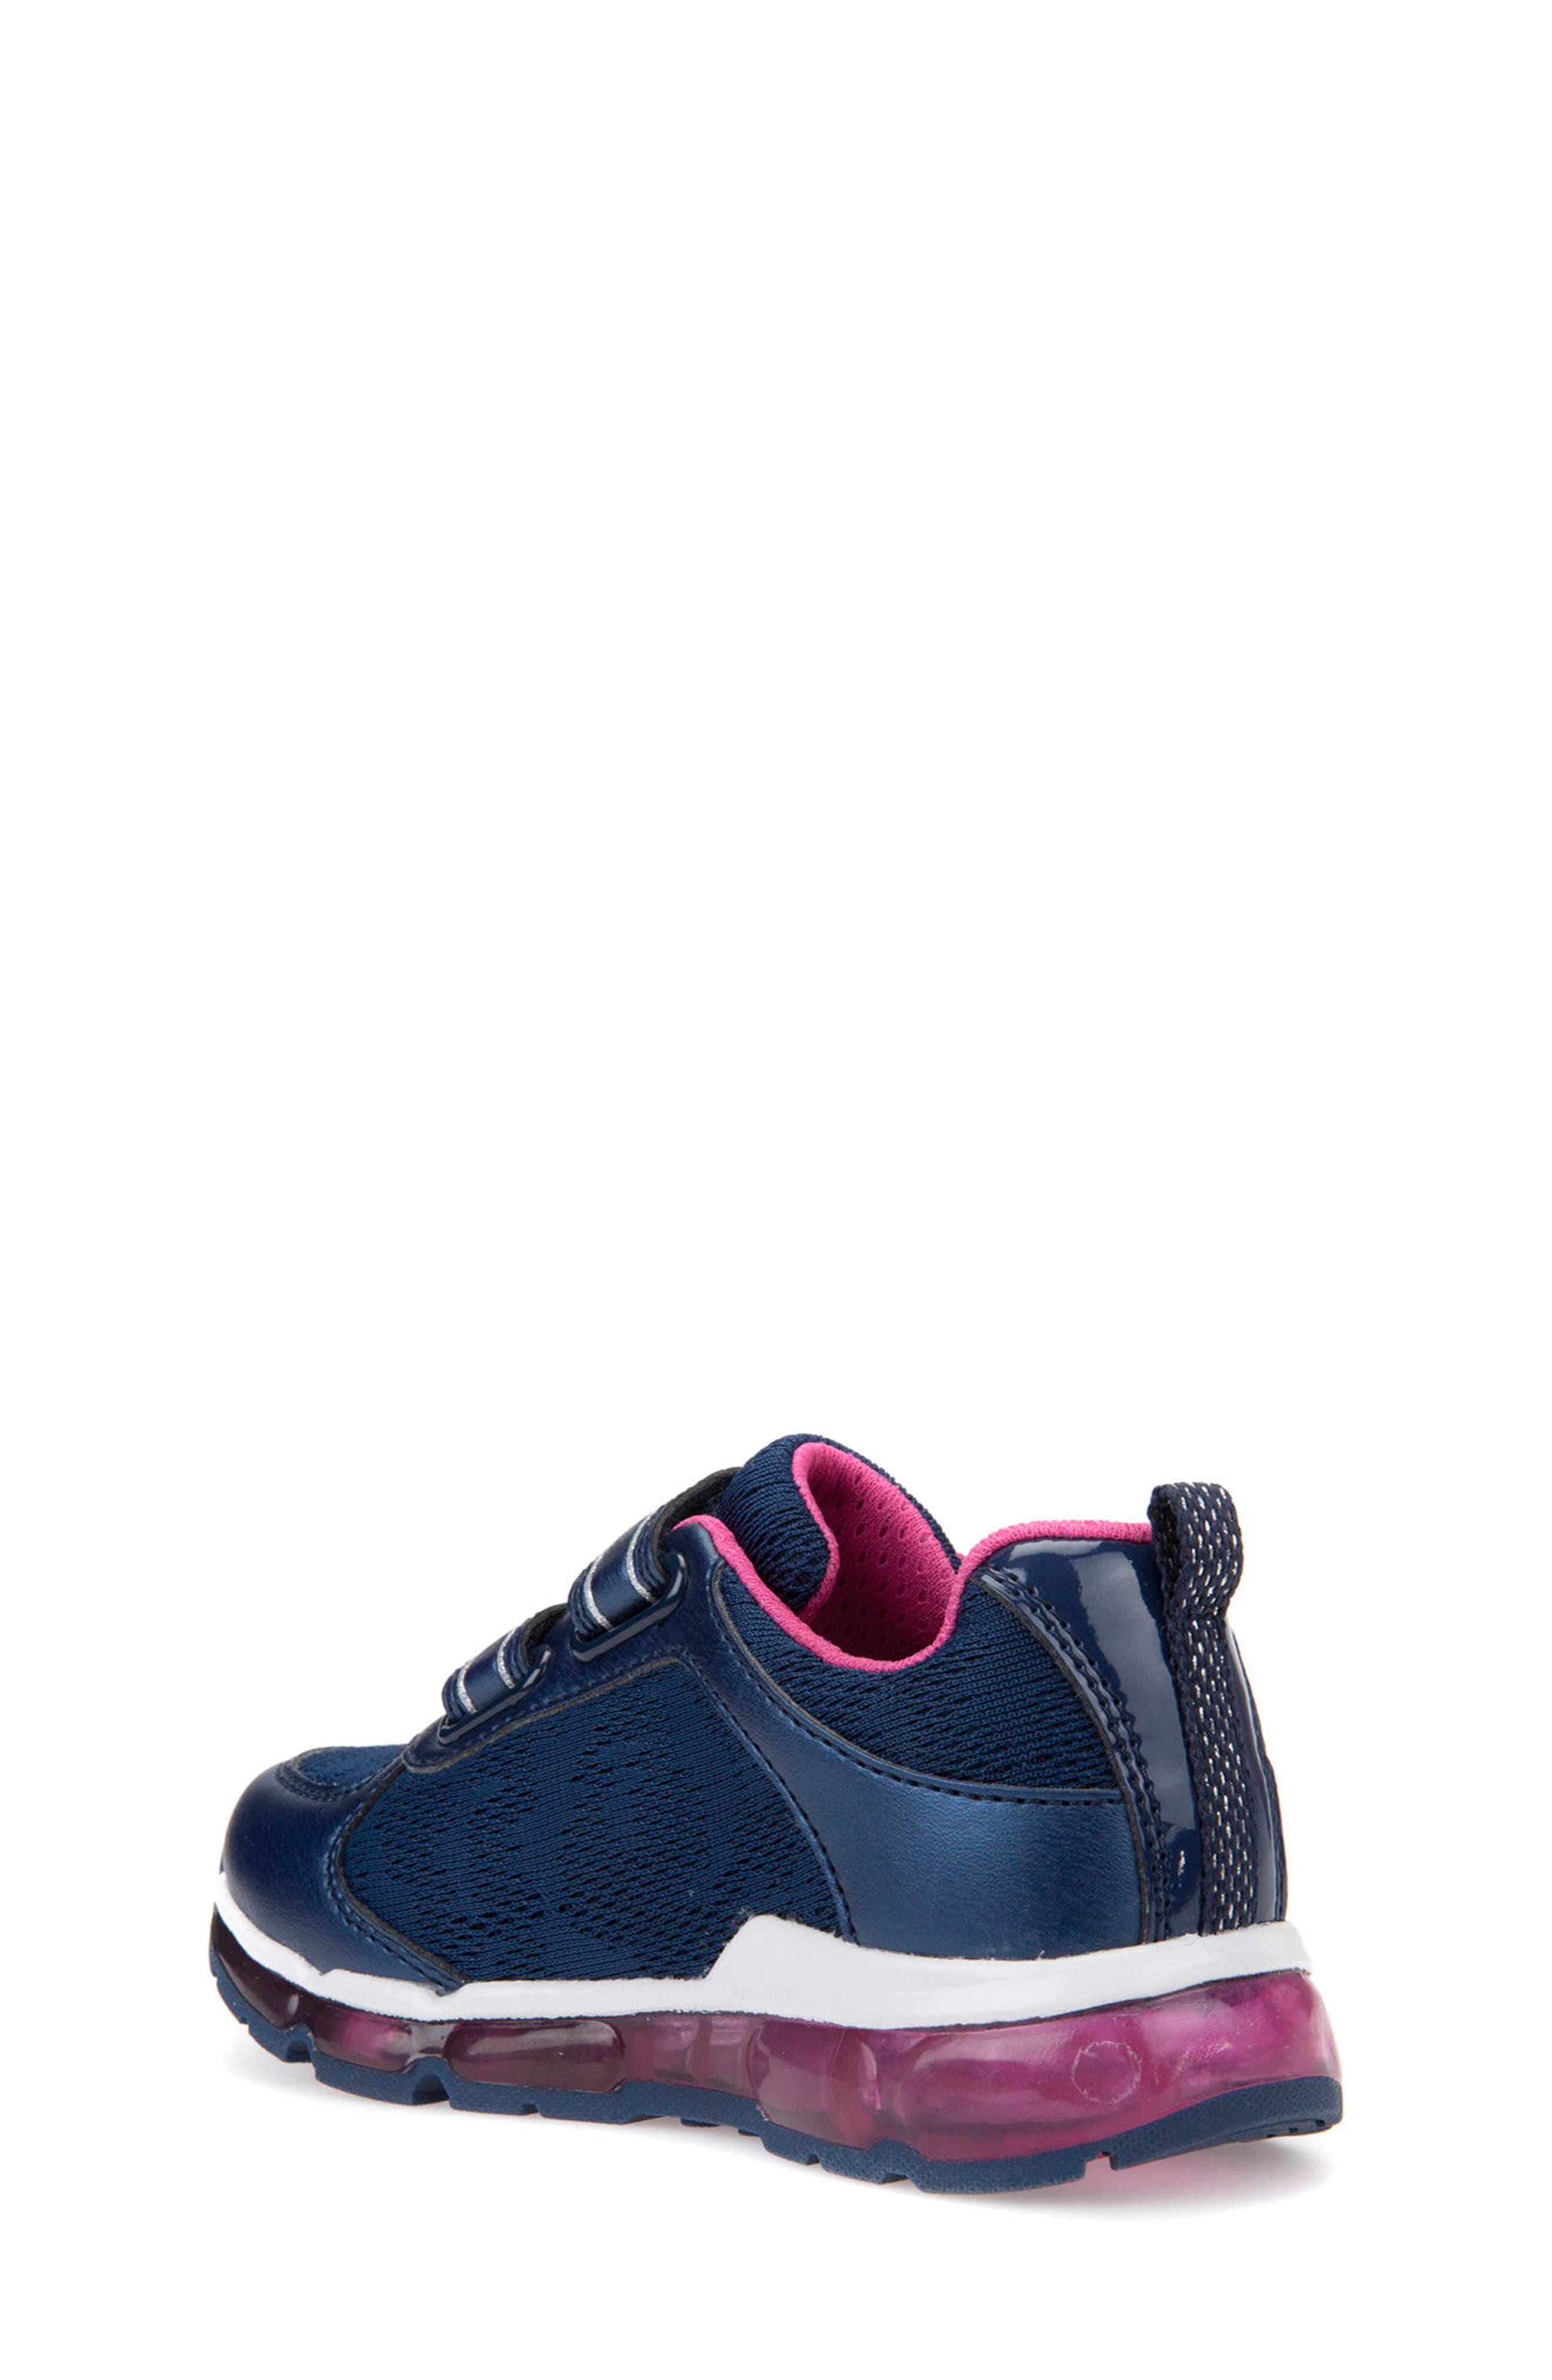 Android Light-Up Sneaker,                             Alternate thumbnail 2, color,                             Navy/ Fuchsia